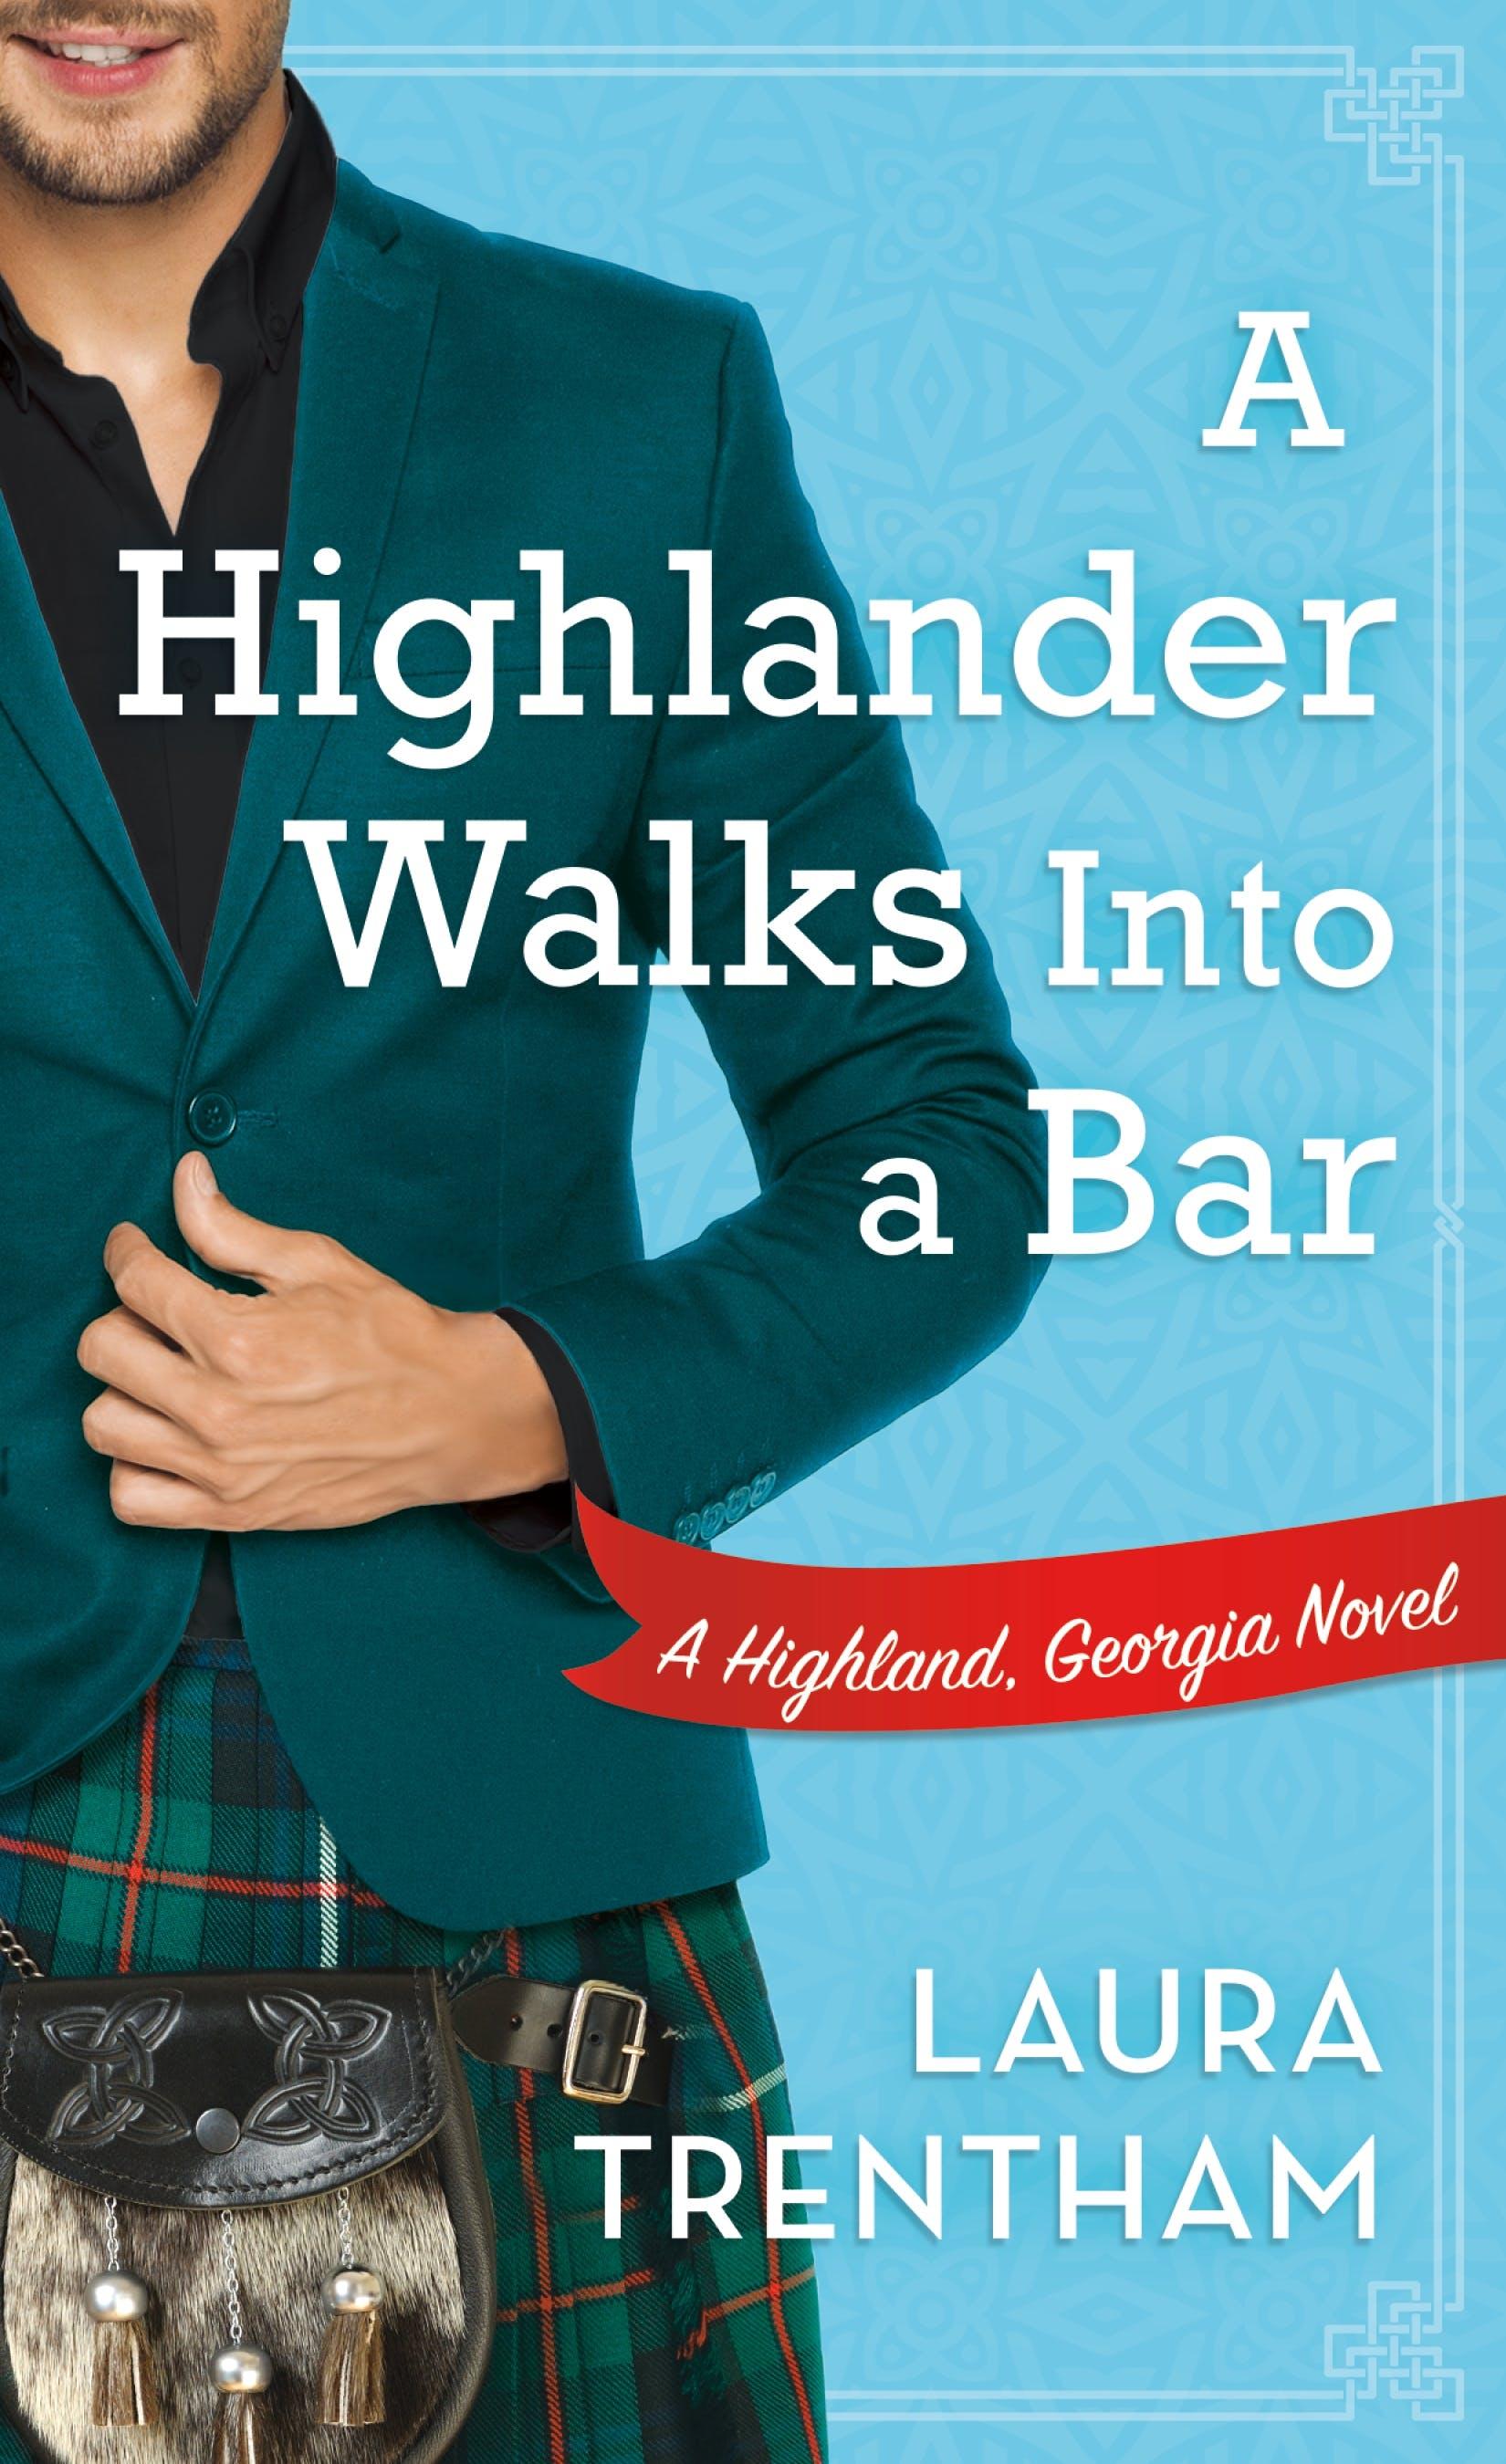 Image of A Highlander Walks into a Bar